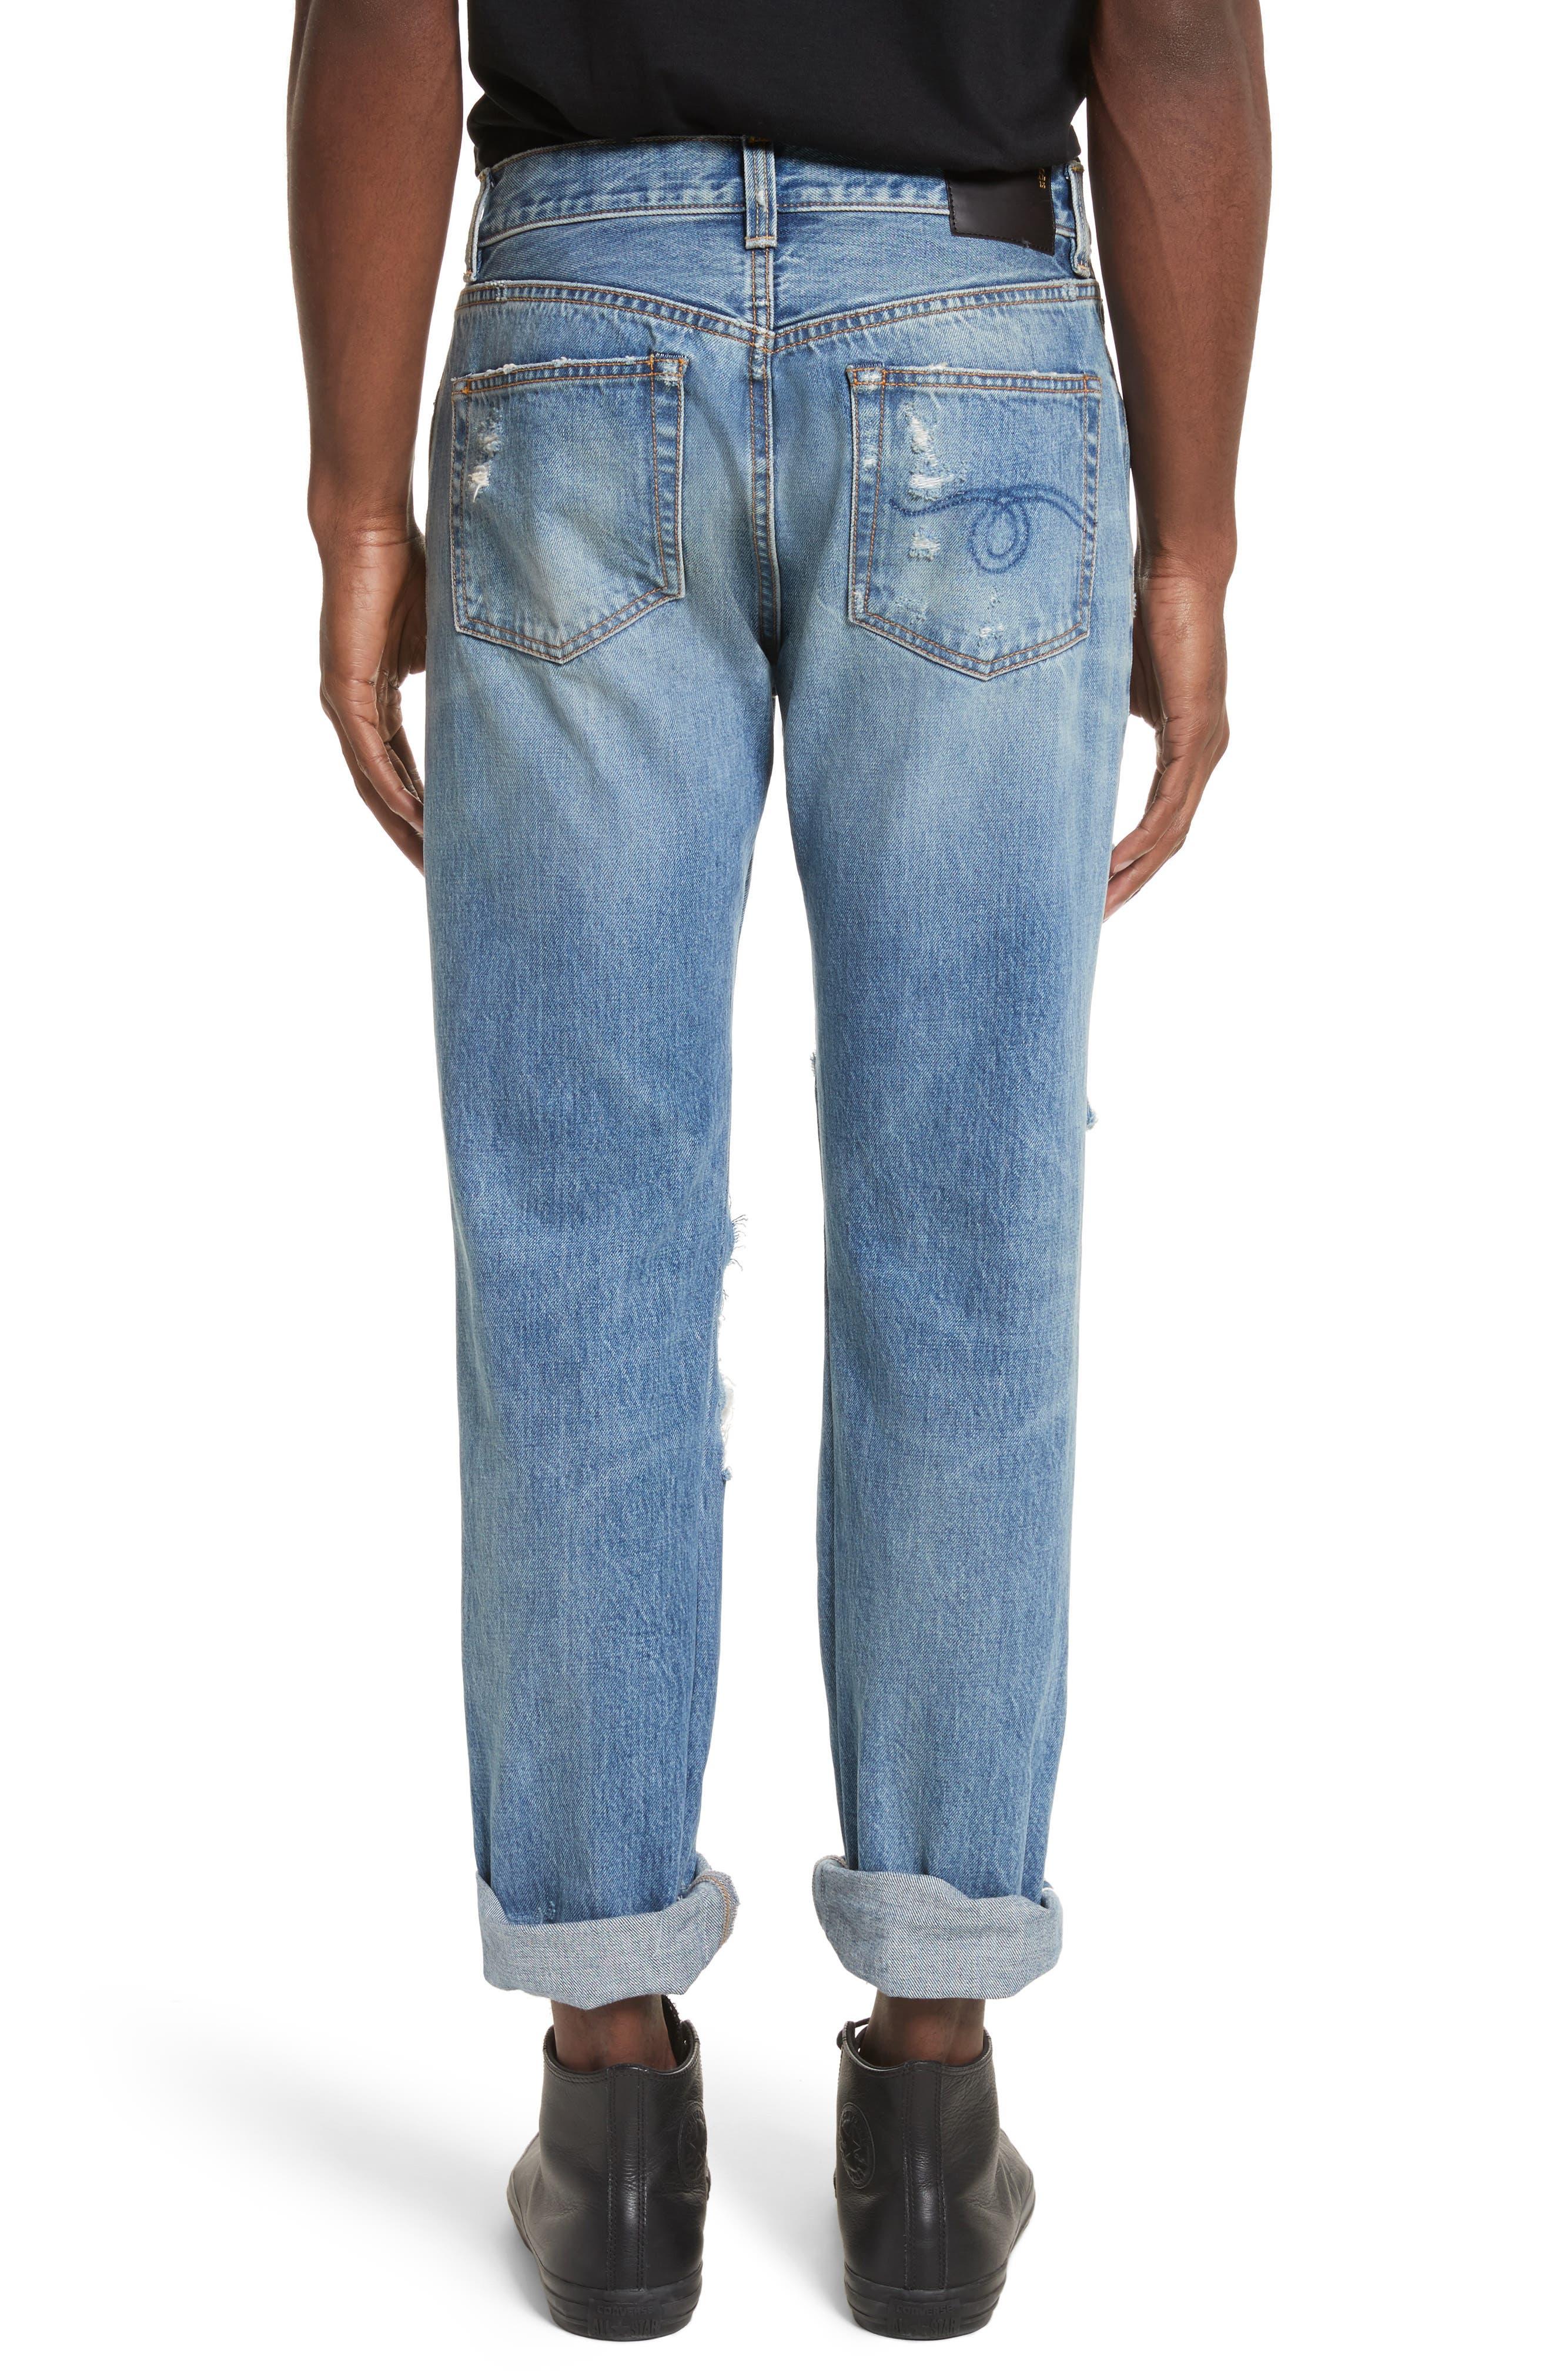 Sid Distressed Cutoff Straight Leg Jeans,                             Alternate thumbnail 2, color,                             Jasper Selvege W Rips